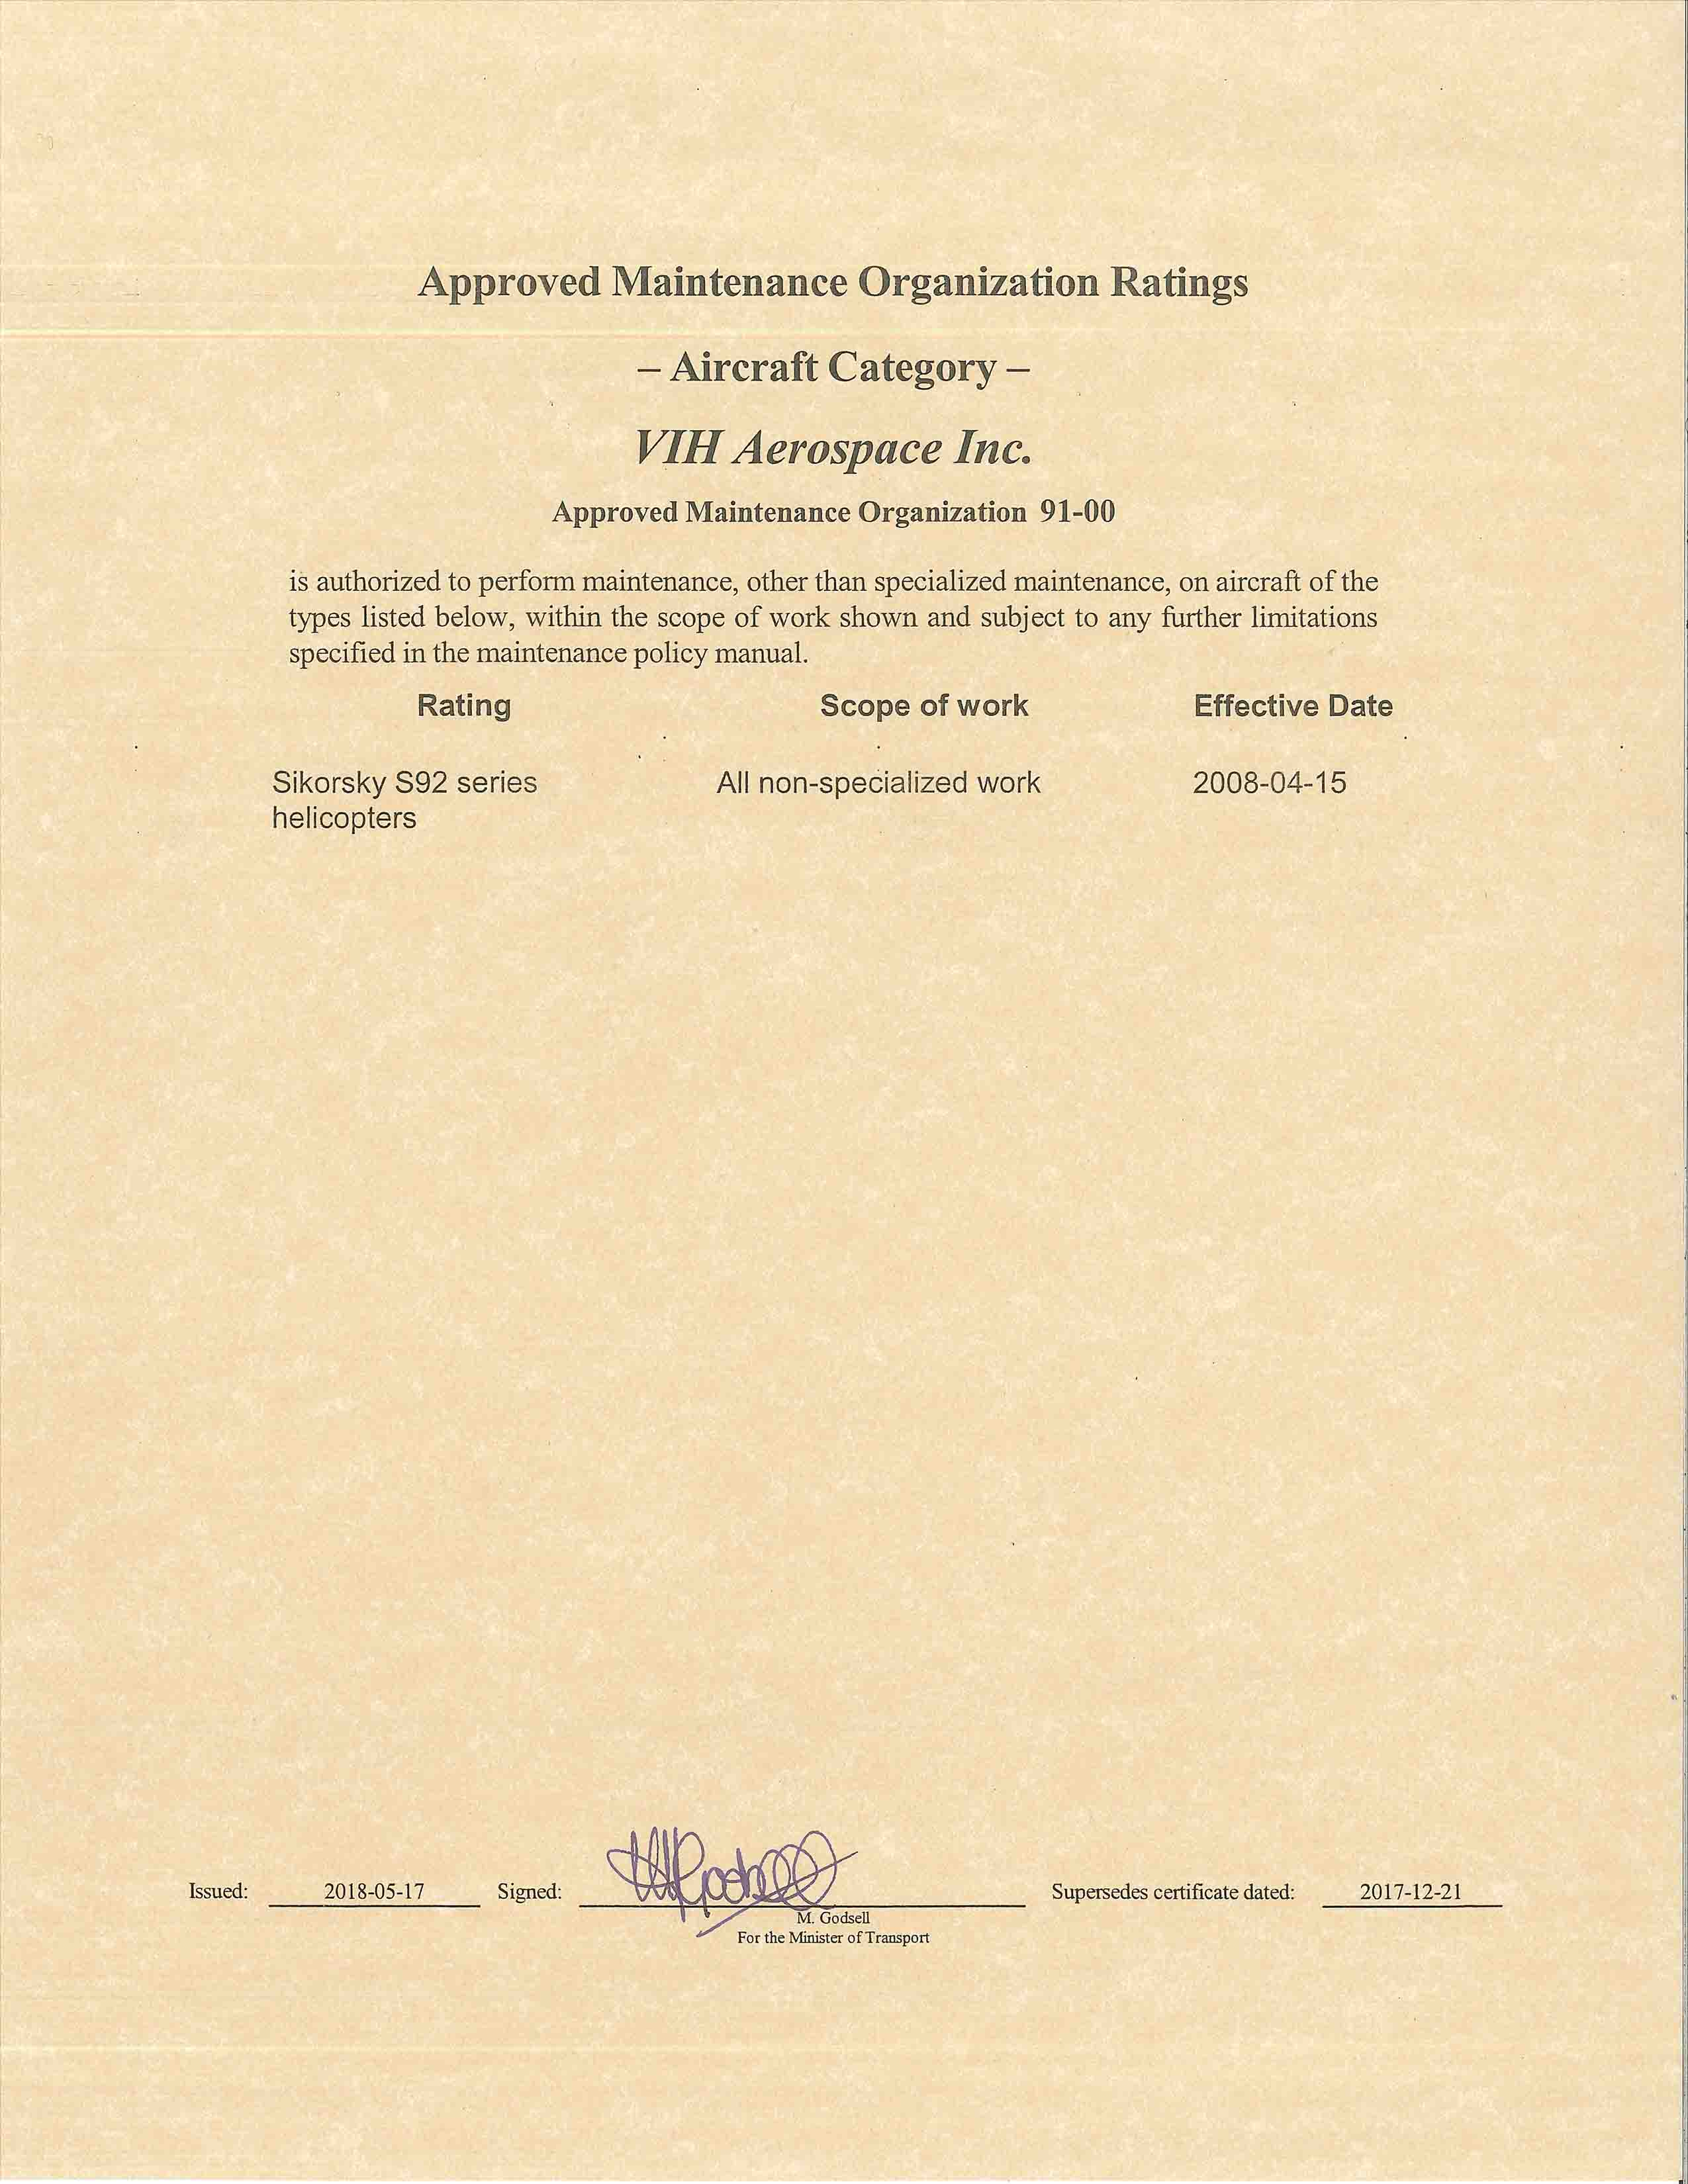 Certificates & Approvals | VIH Aerospace